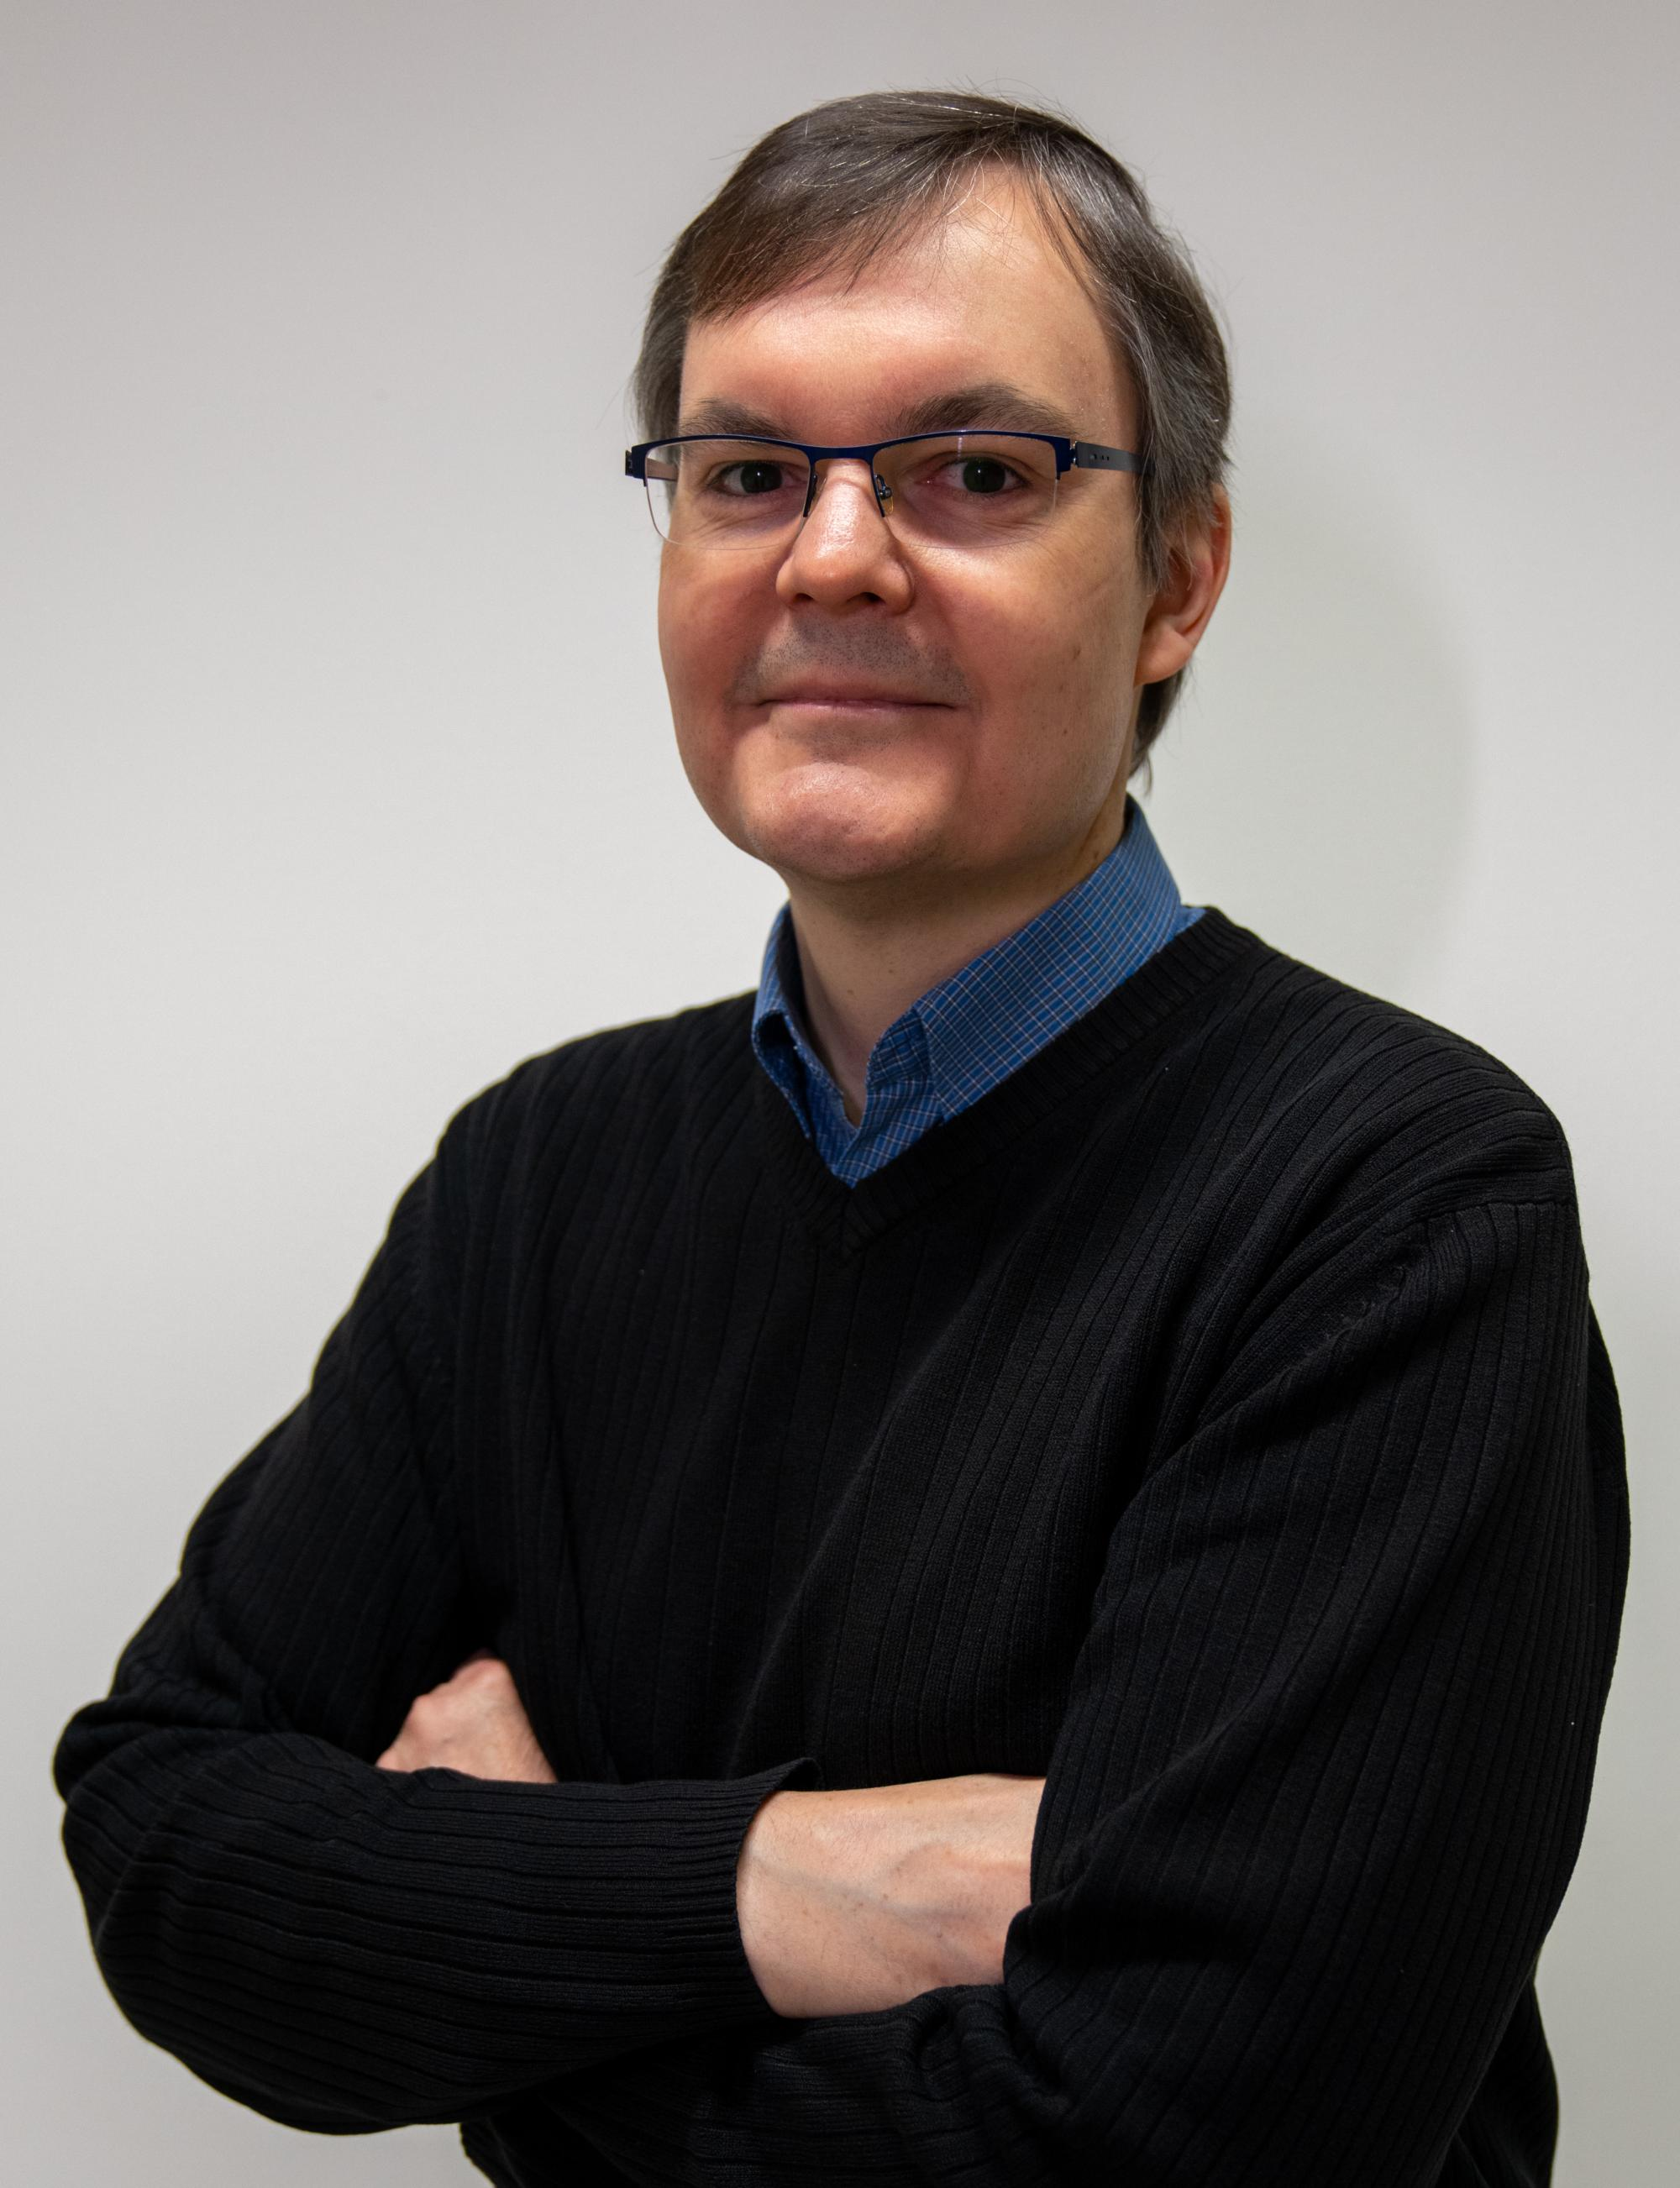 Fabien Kuttler